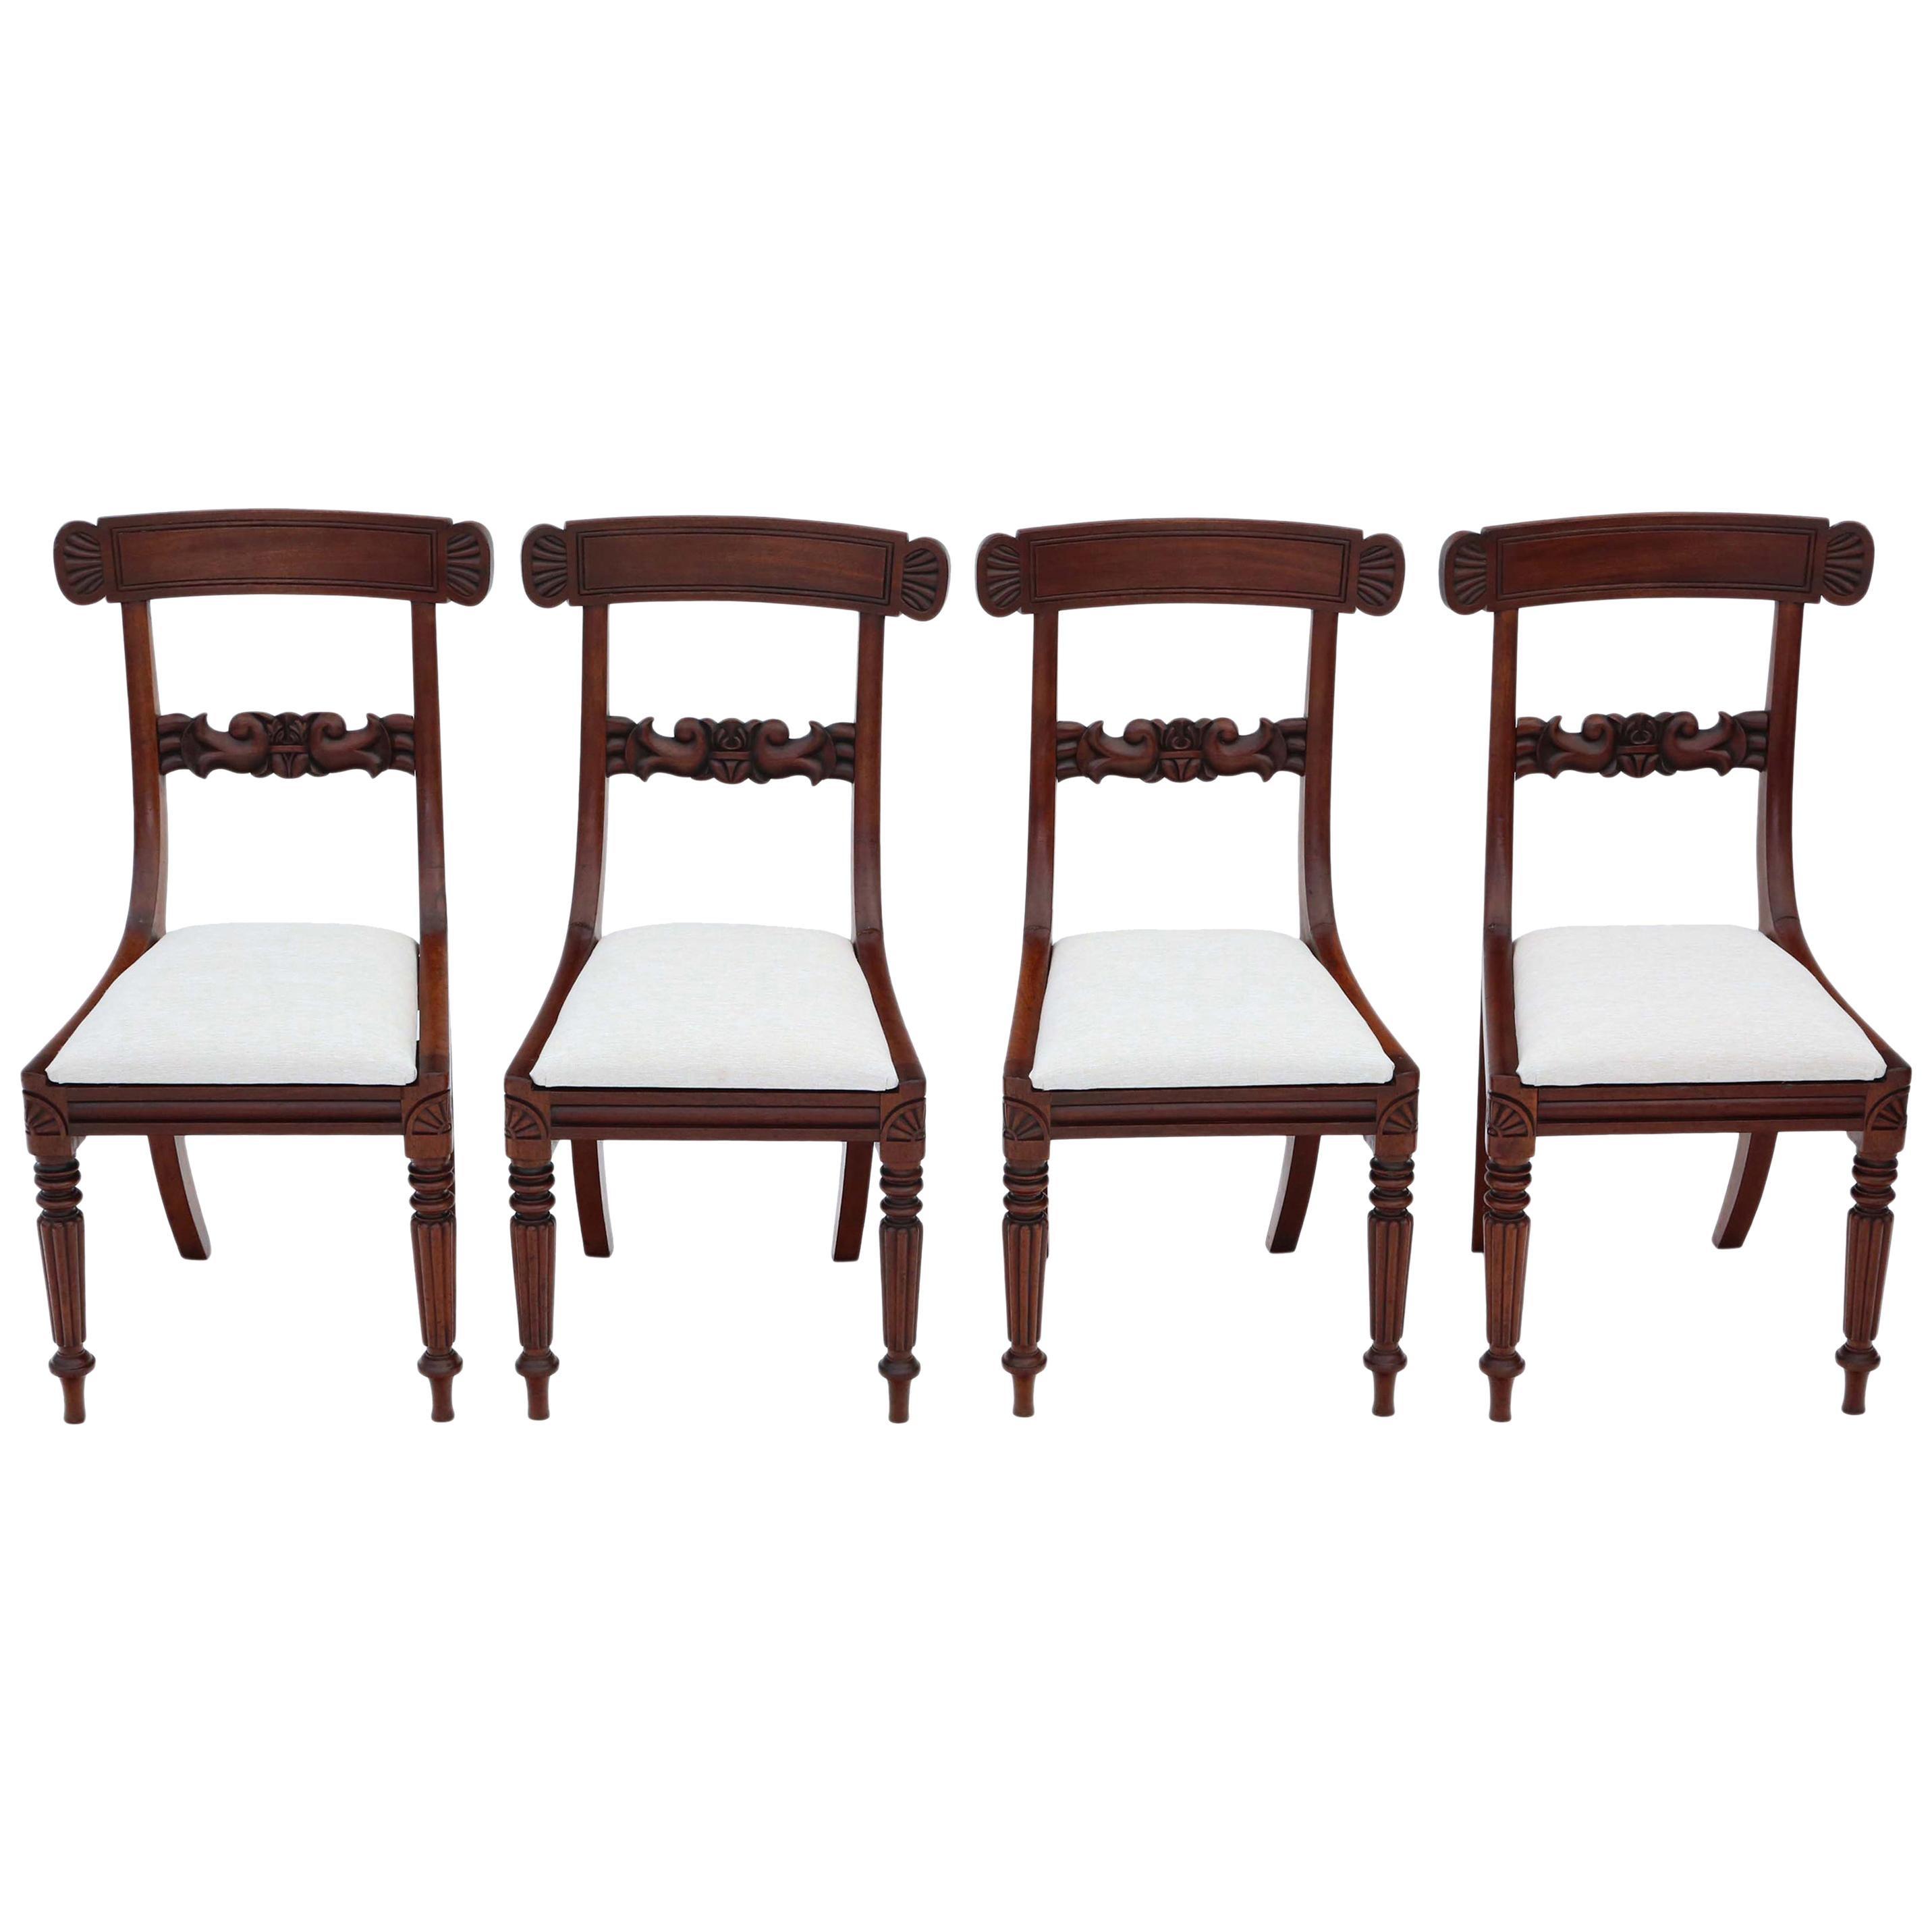 Set of 4 William IV Mahogany Bar Back Dining Chairs